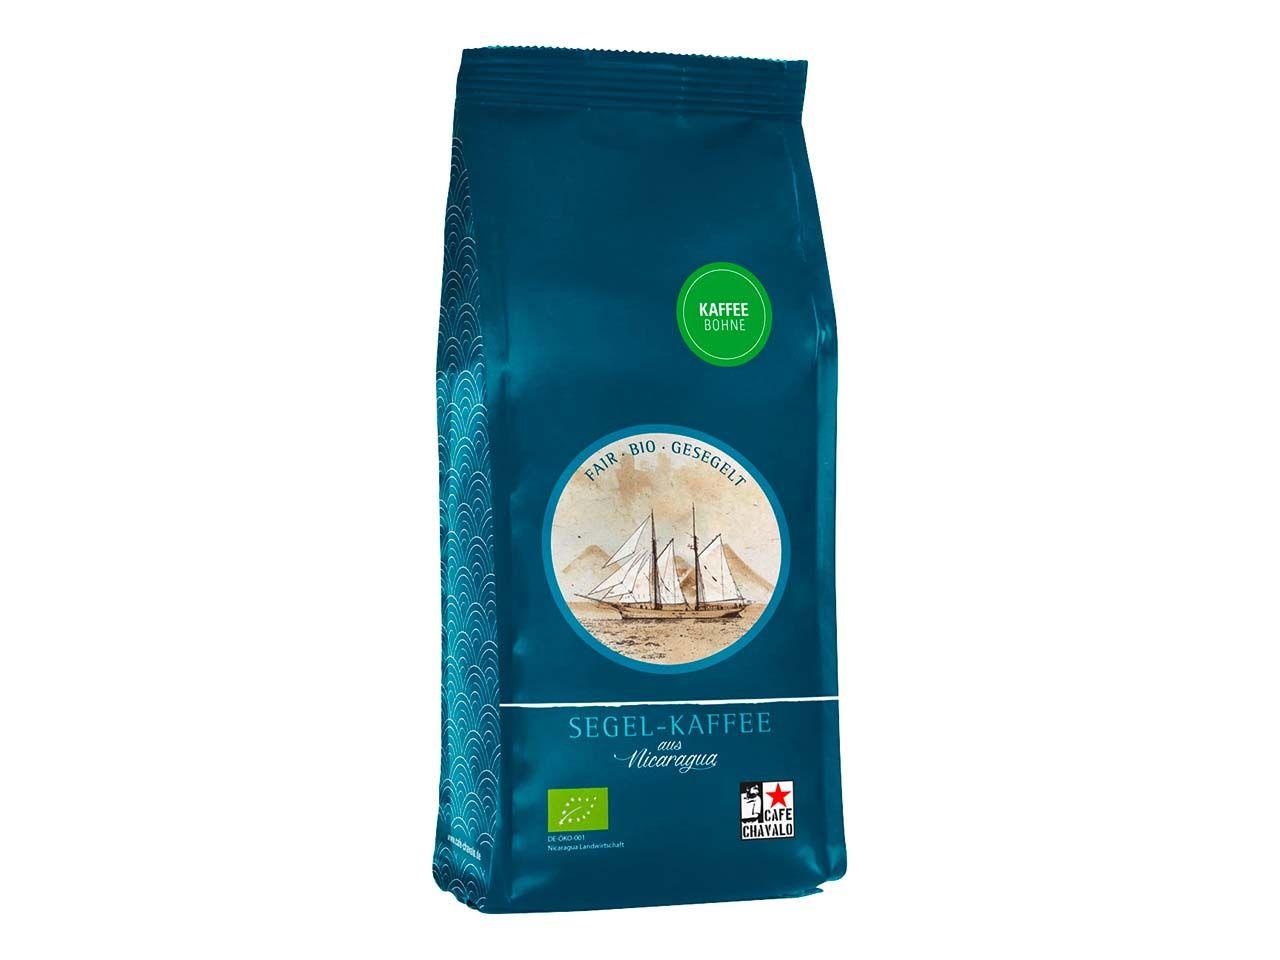 Café Chavalo Bio-Kaffee